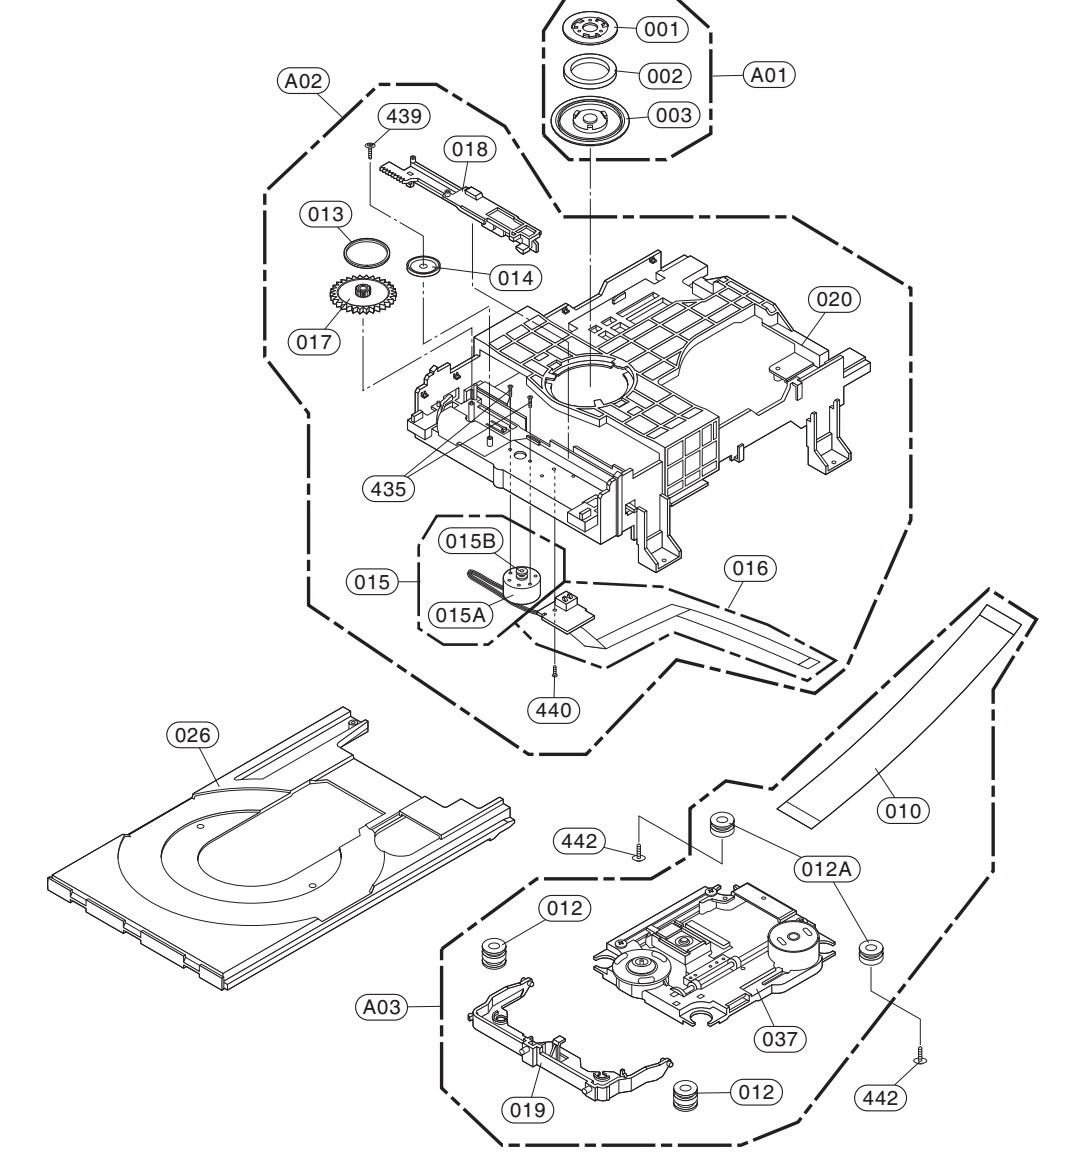 LG CMS7520F/W - LG CM7520